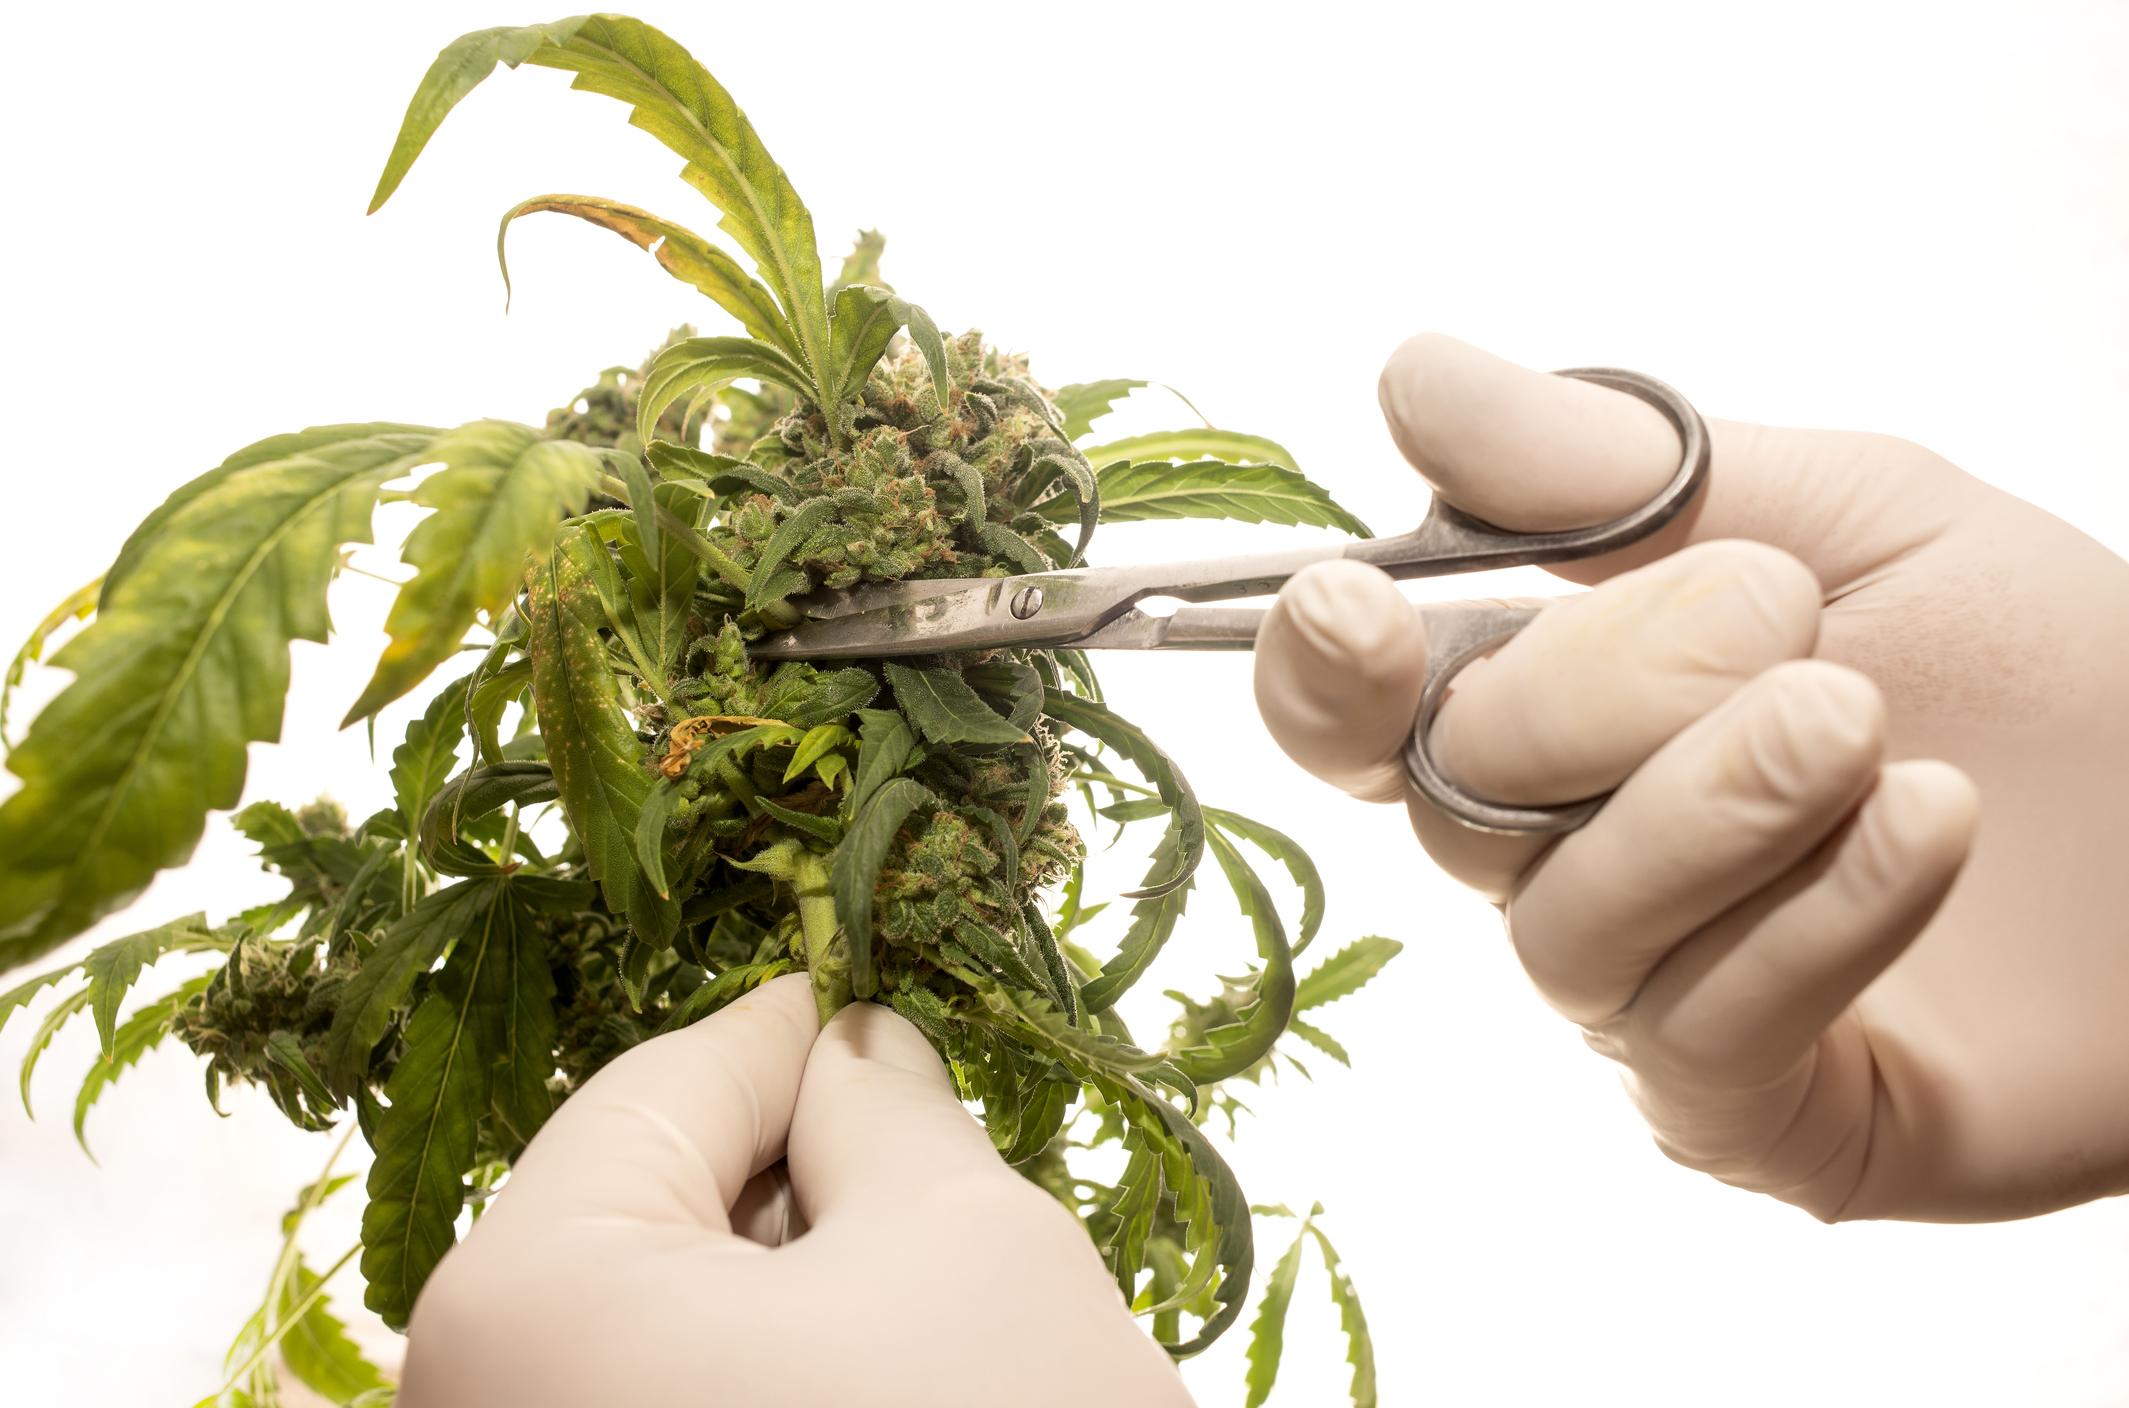 Hands holding scissors to trim cannabis plant.